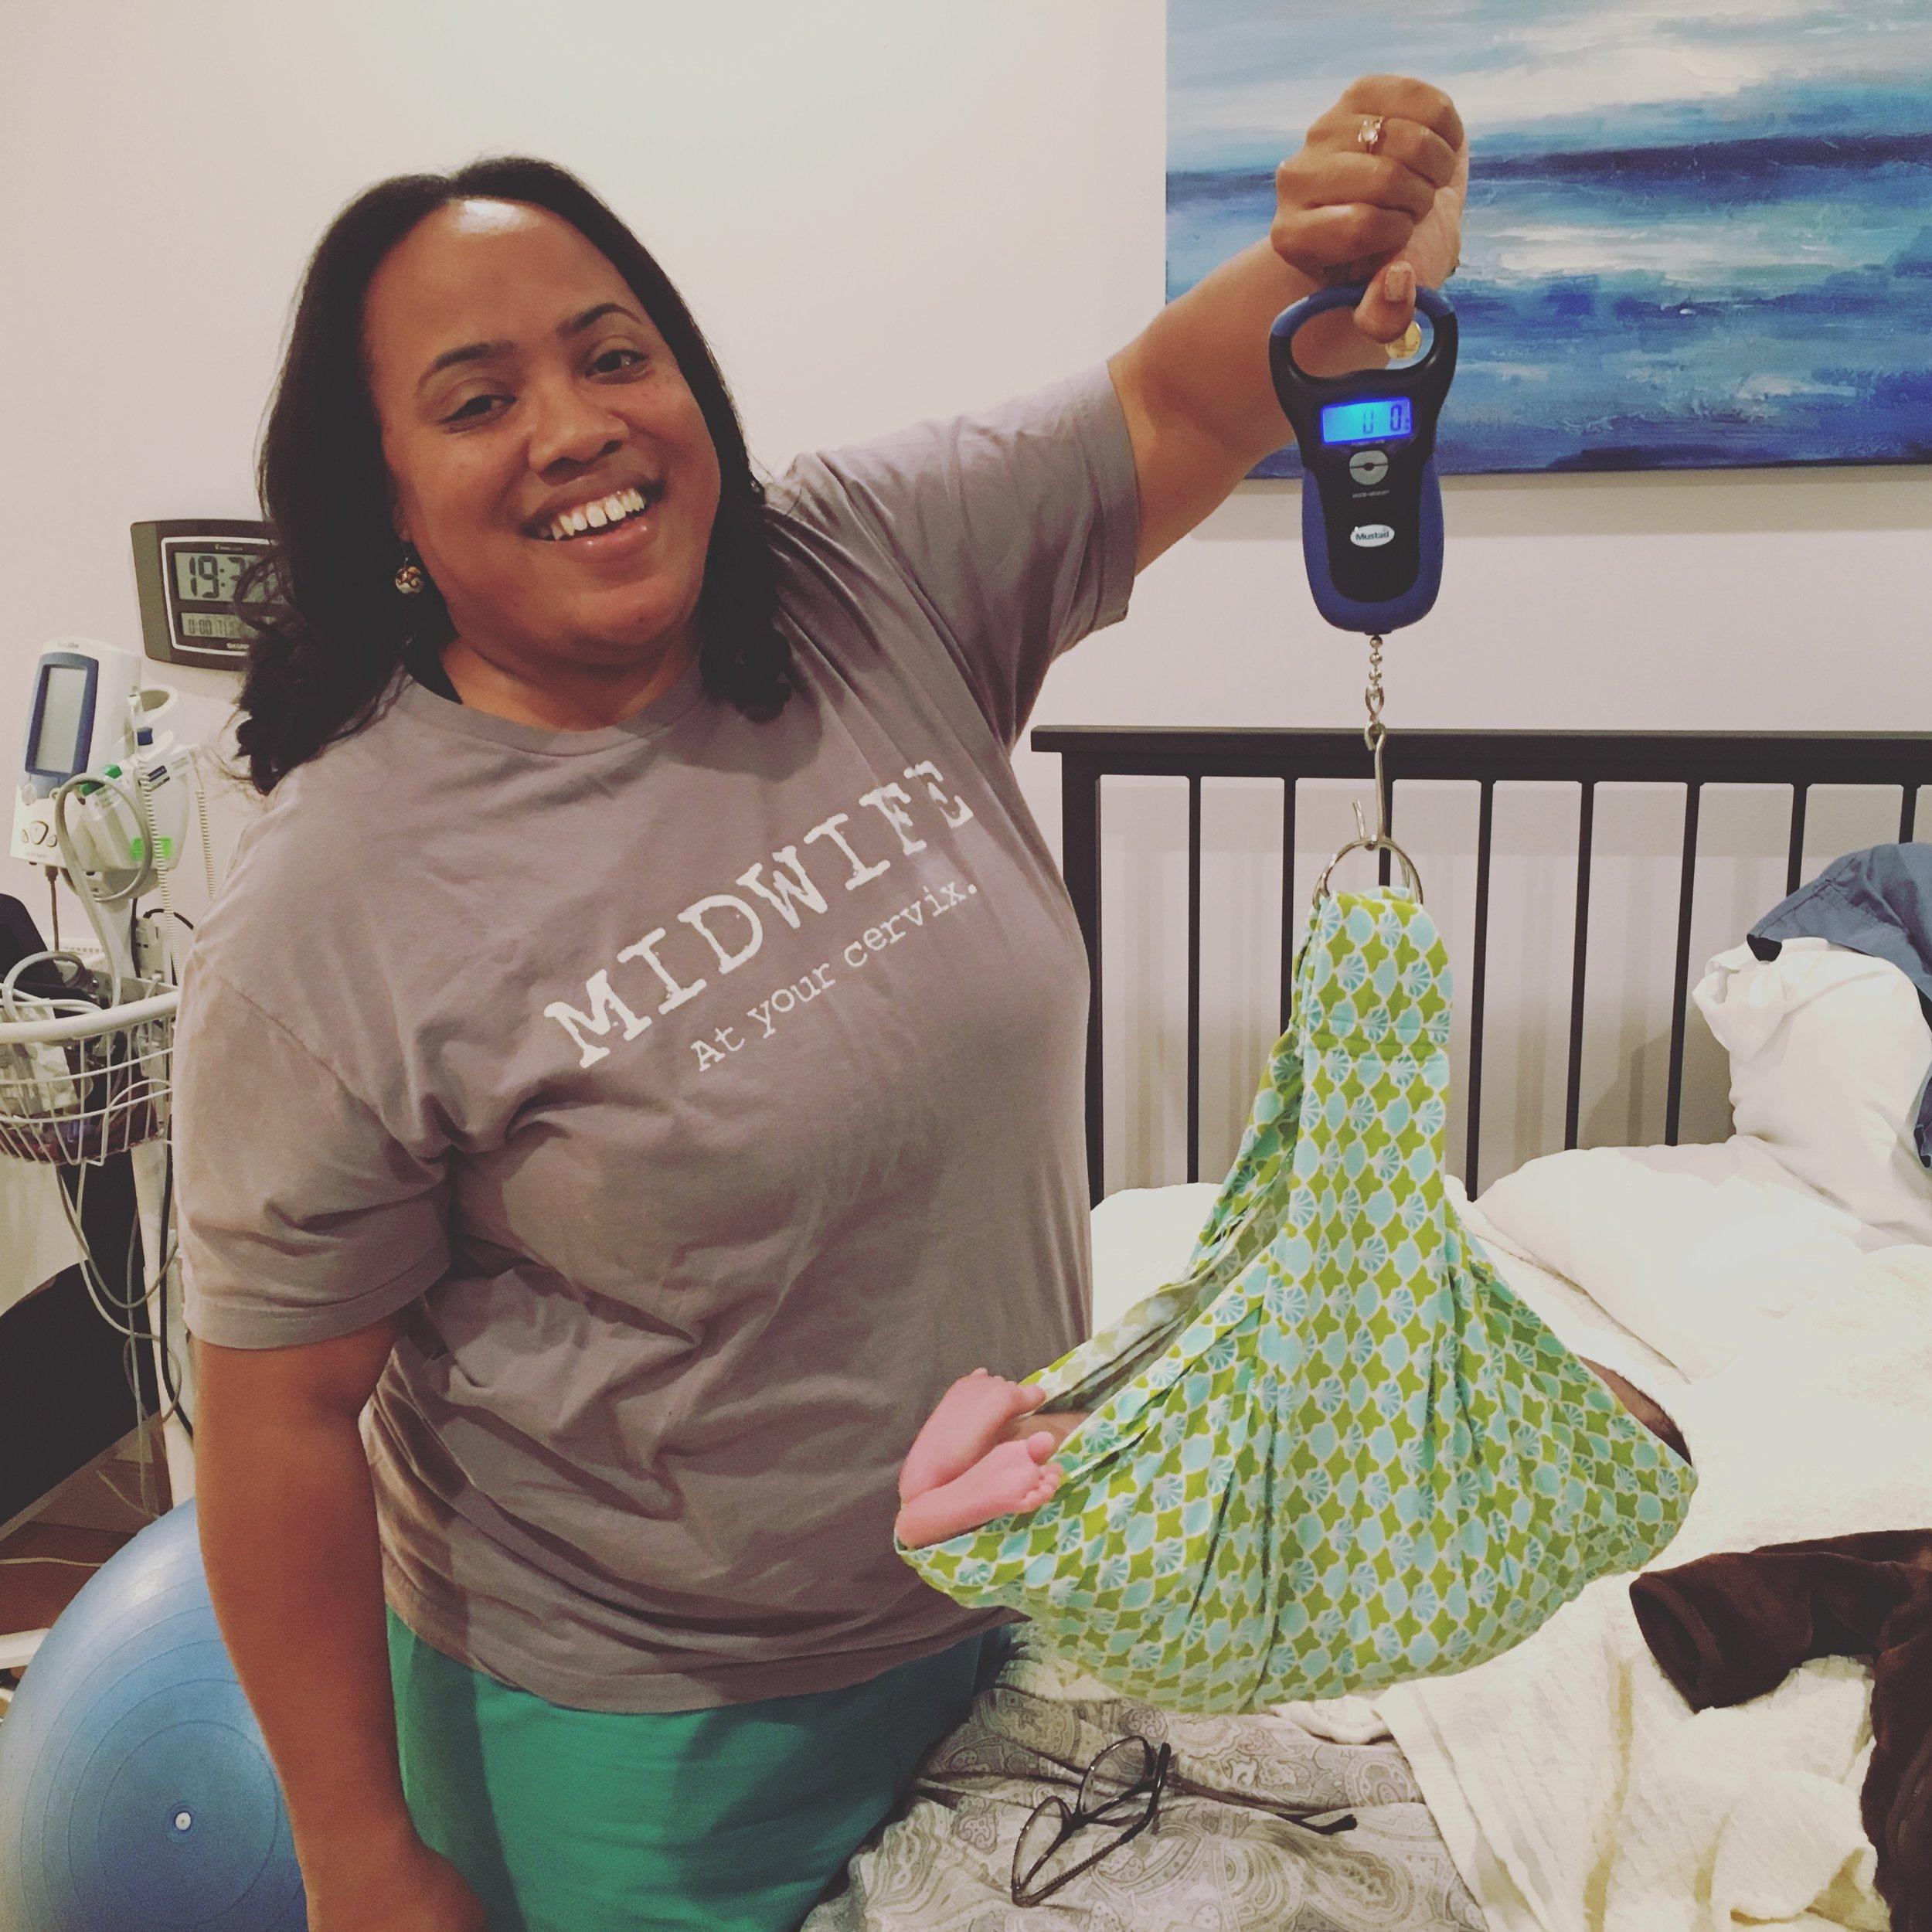 Midwife Ebony Marcelle